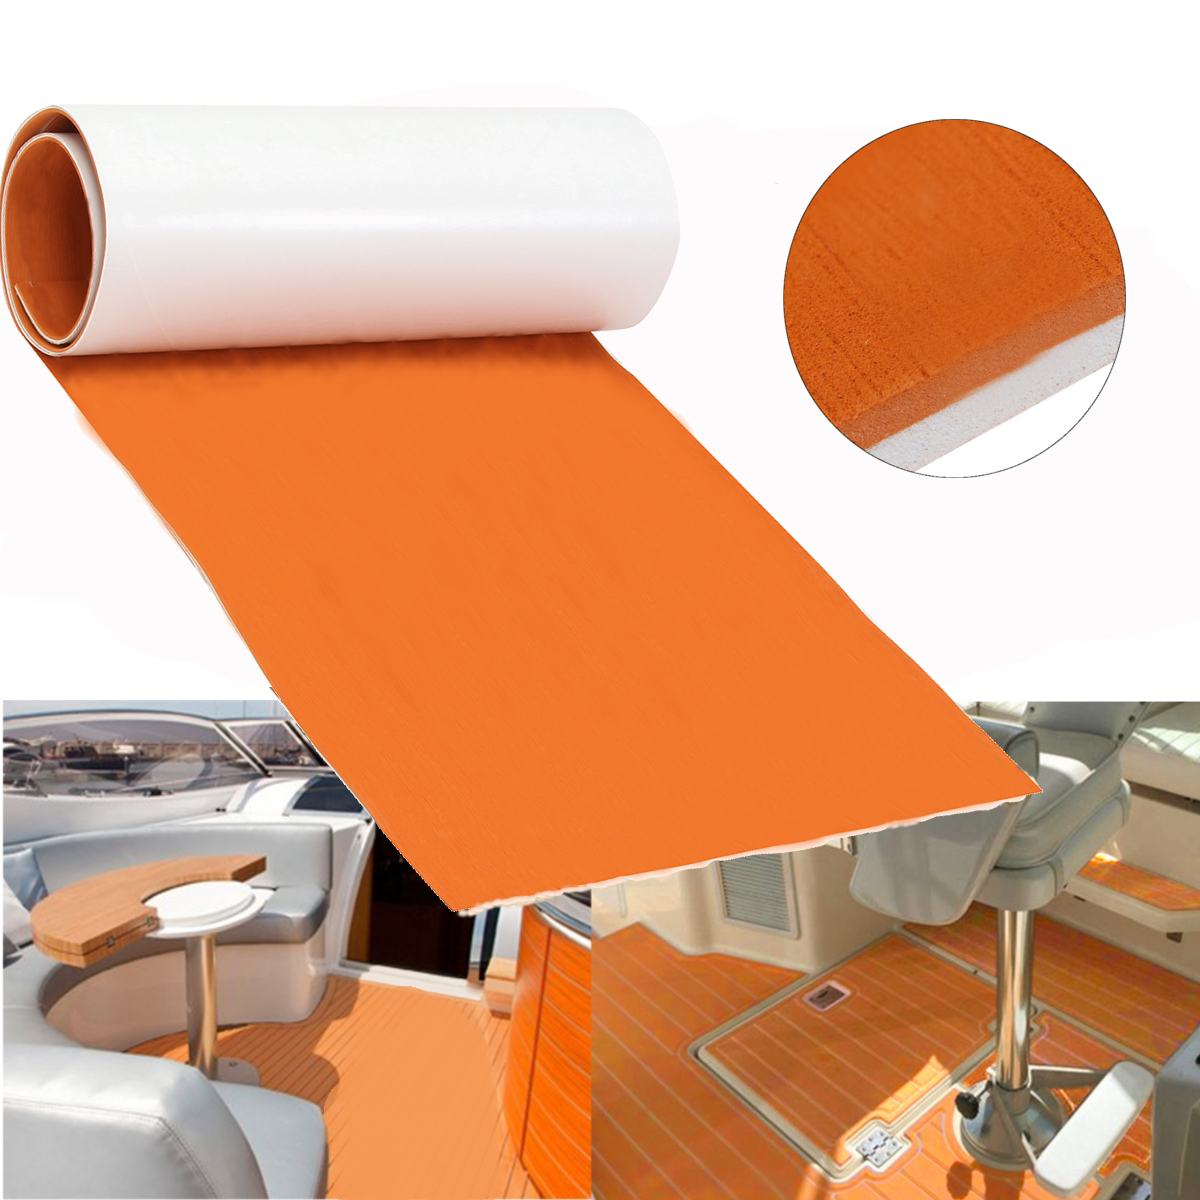 60CMx200CM 6mm Self Adhesive RV Marine Flooring EVA Foam teak Boat Decking Teak Sheet Yacht Floor Pad Foam Floor Mat Orange teak house ваза ingrid